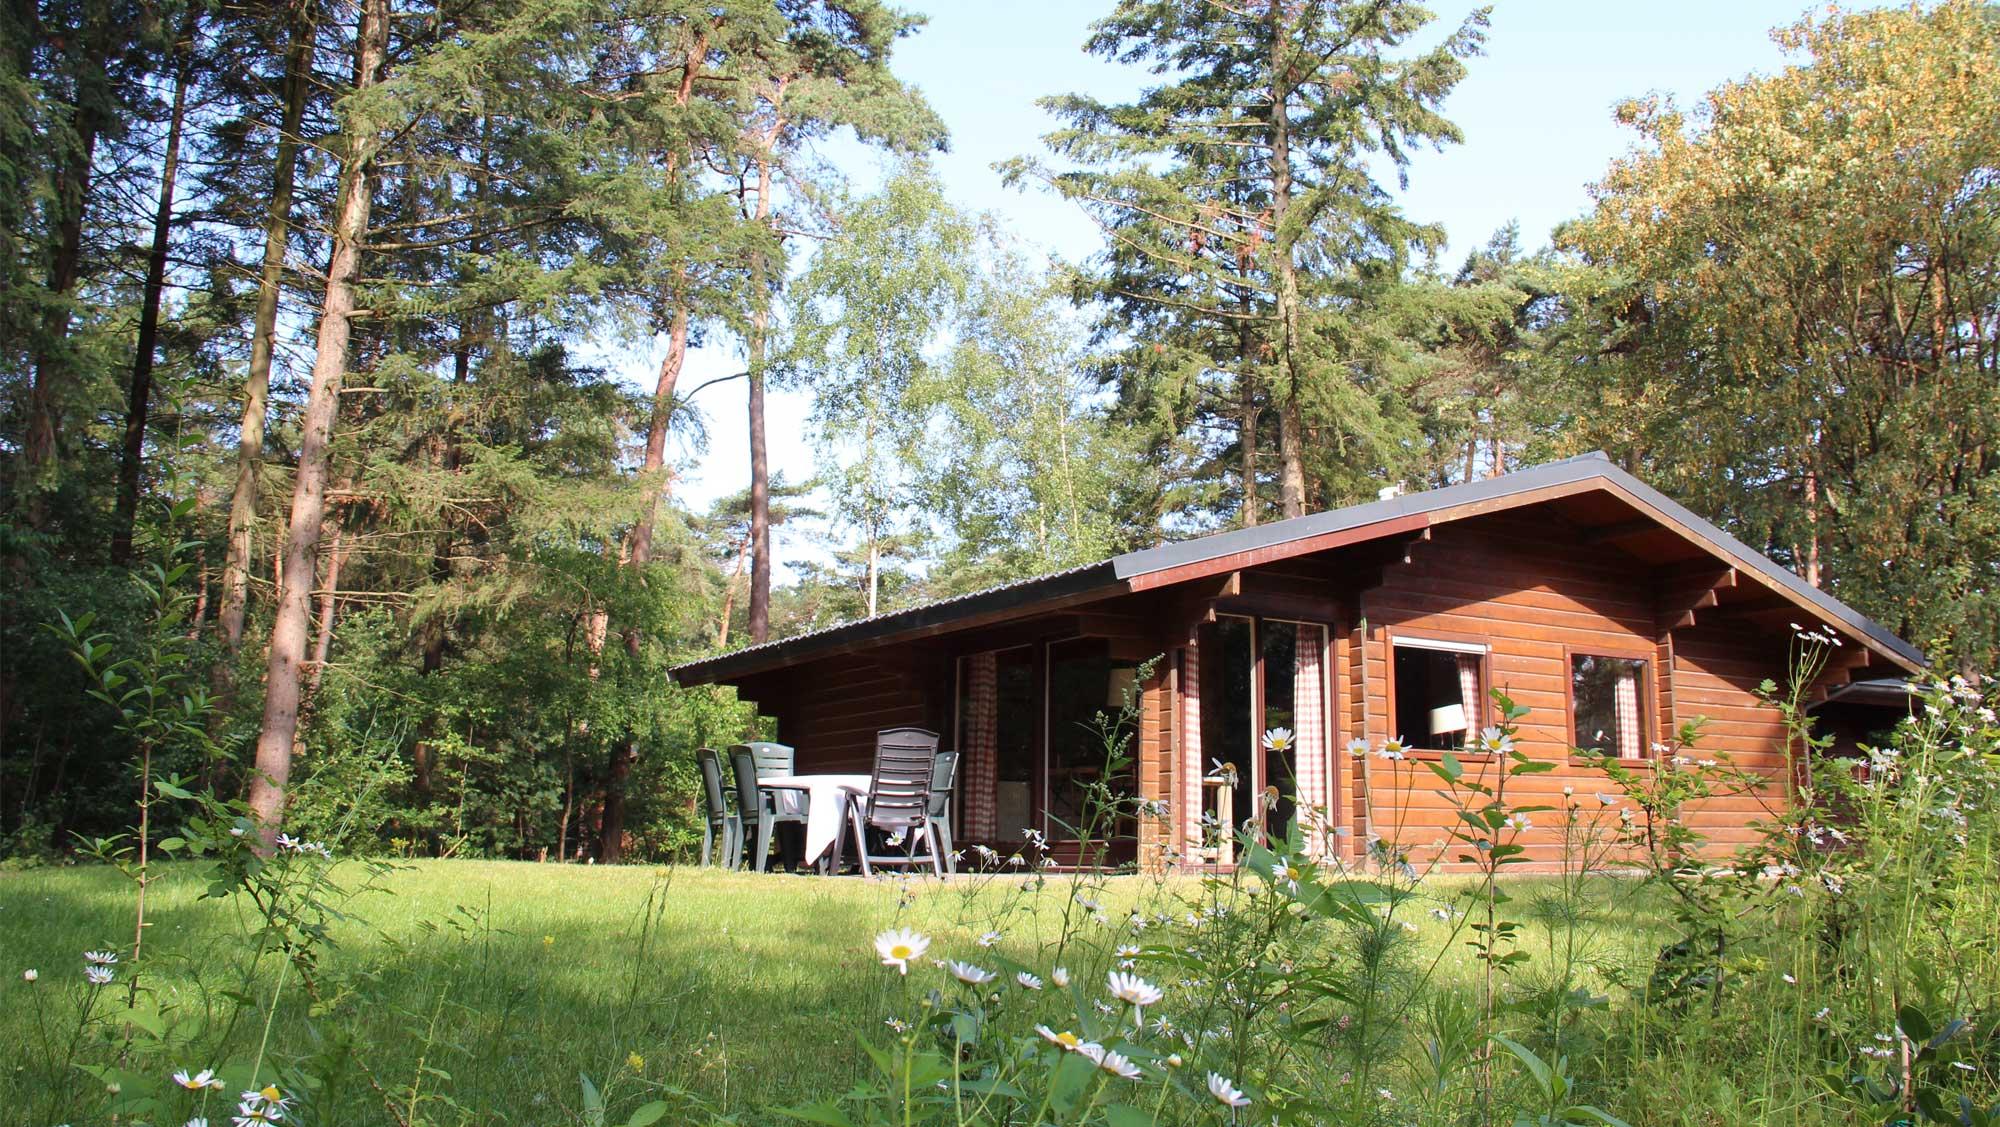 6pers bungalow Finse Molecaten Park Landgoed Ginkelduin 01